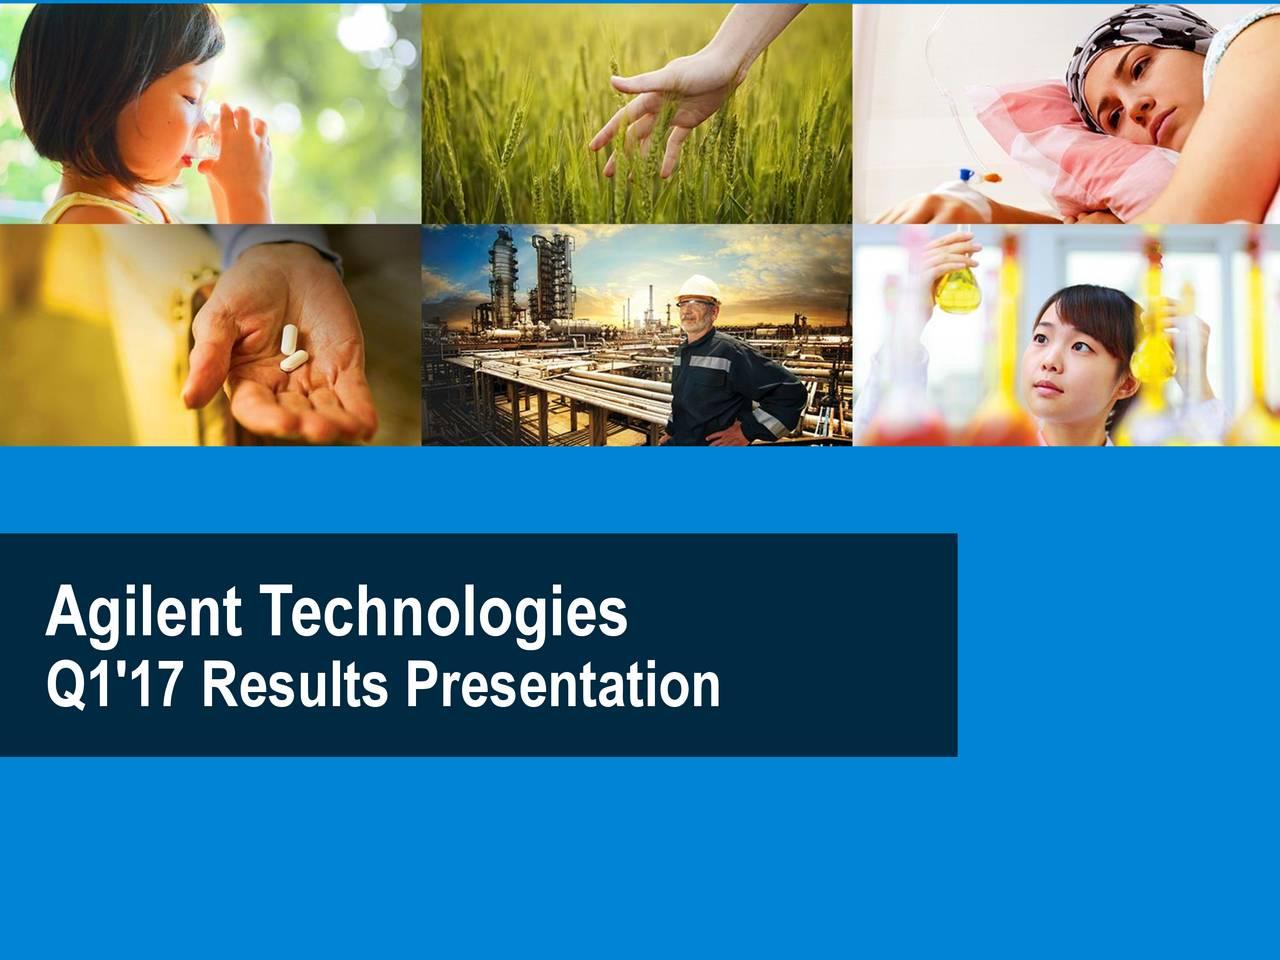 Q1'17 Results Presentation